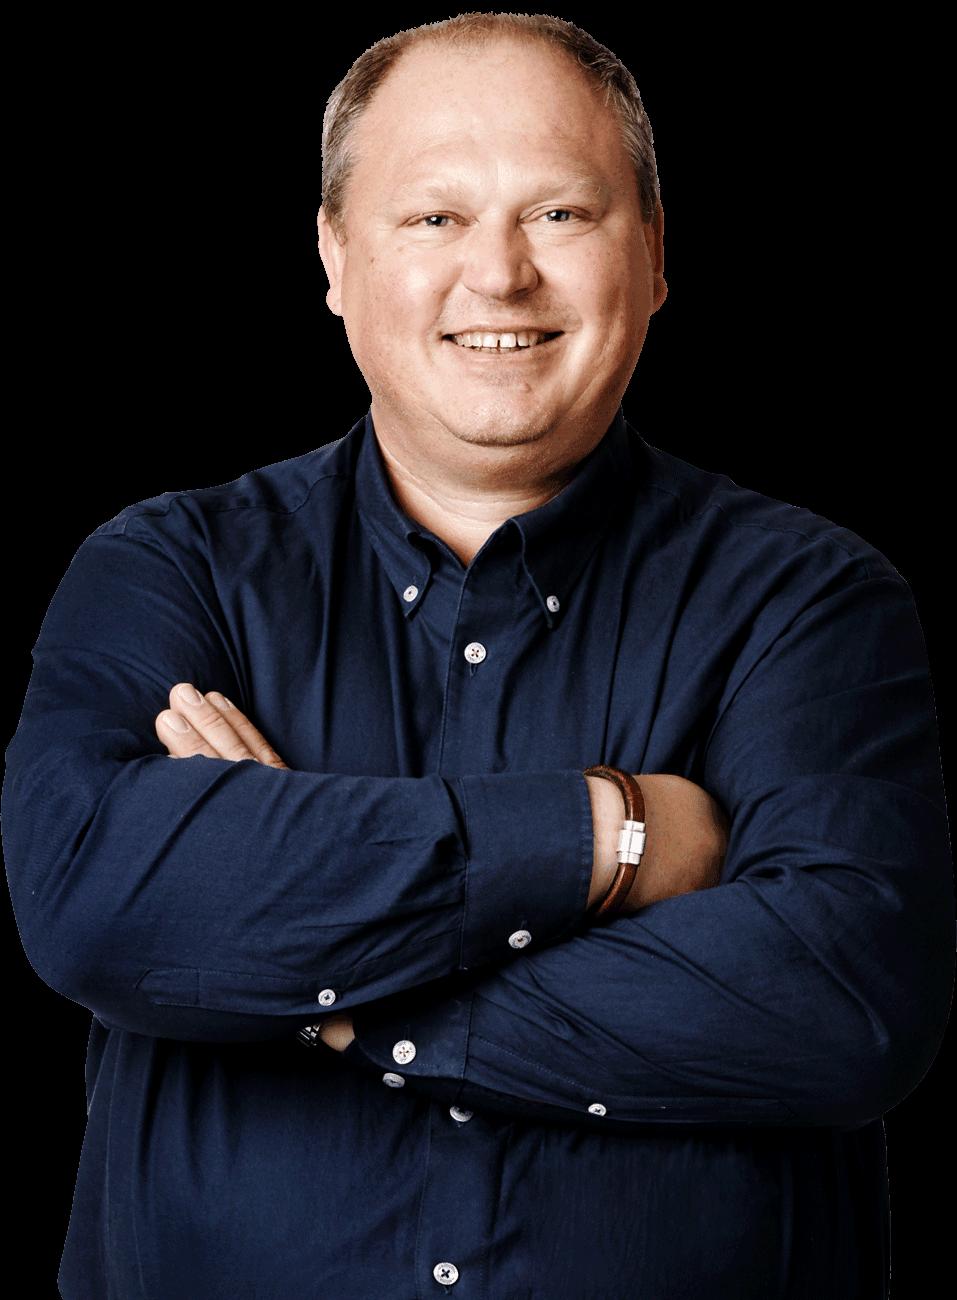 Stefan Dehler